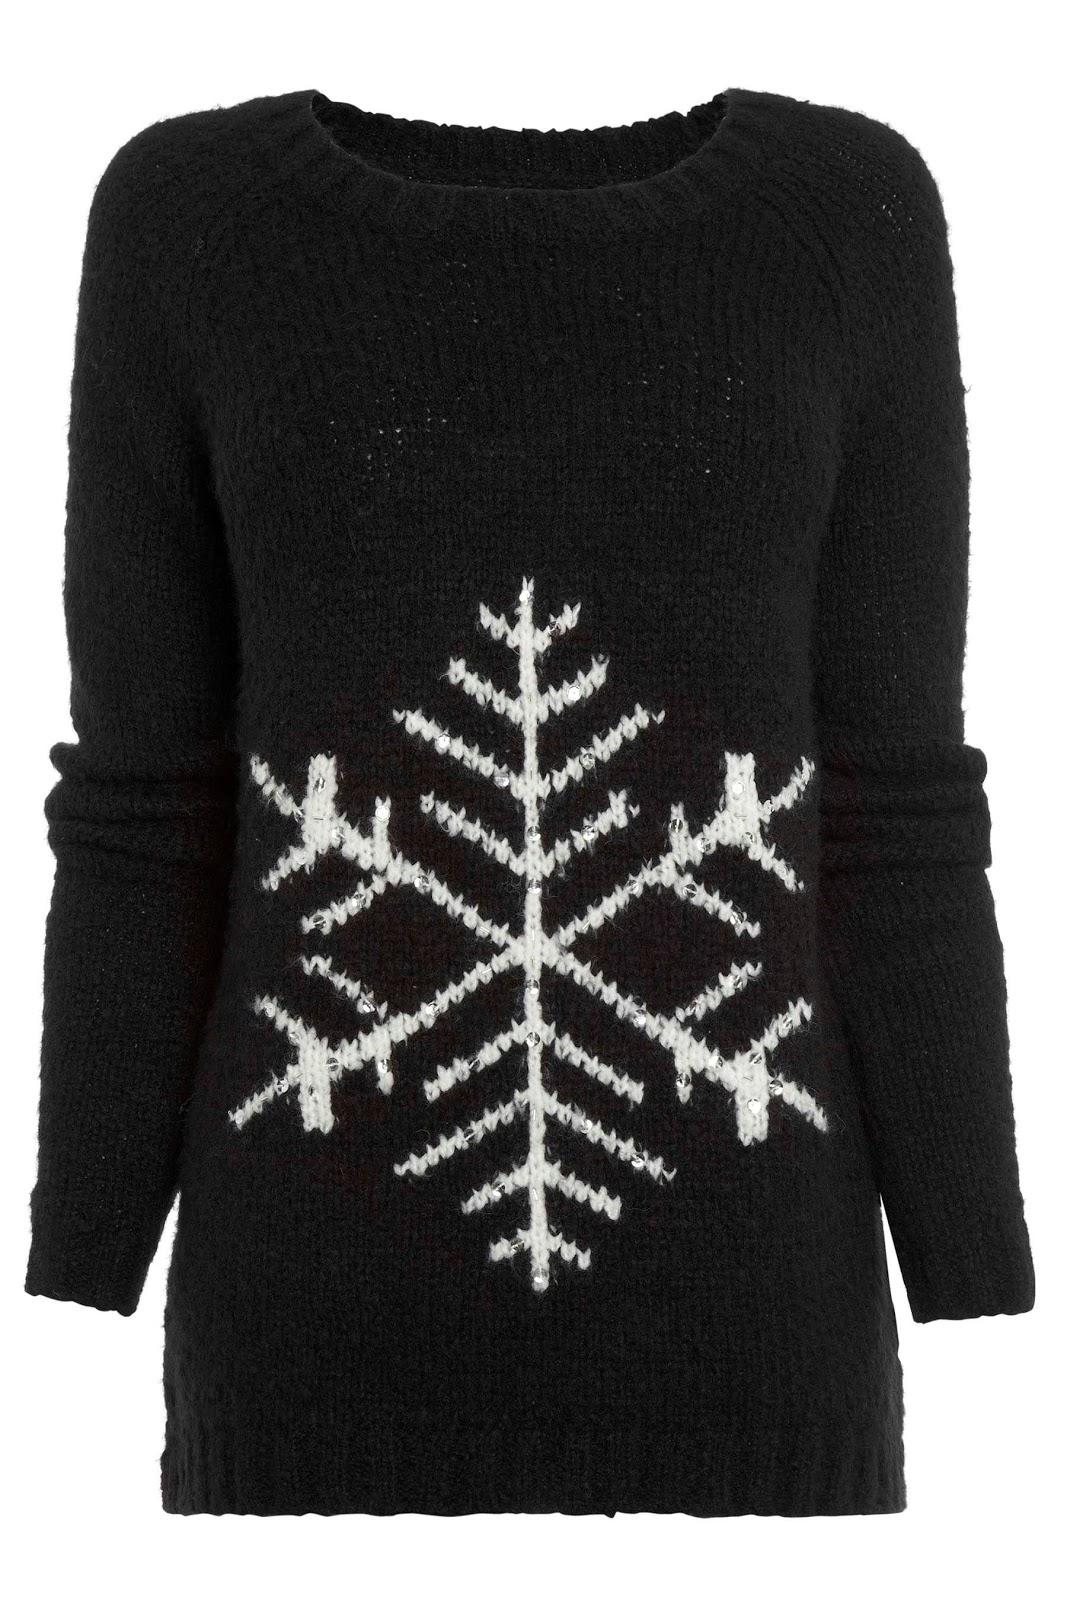 GIRL ORB   UK Fashion & Beauty Blog: Best Women\'s Christmas Jumpers ...